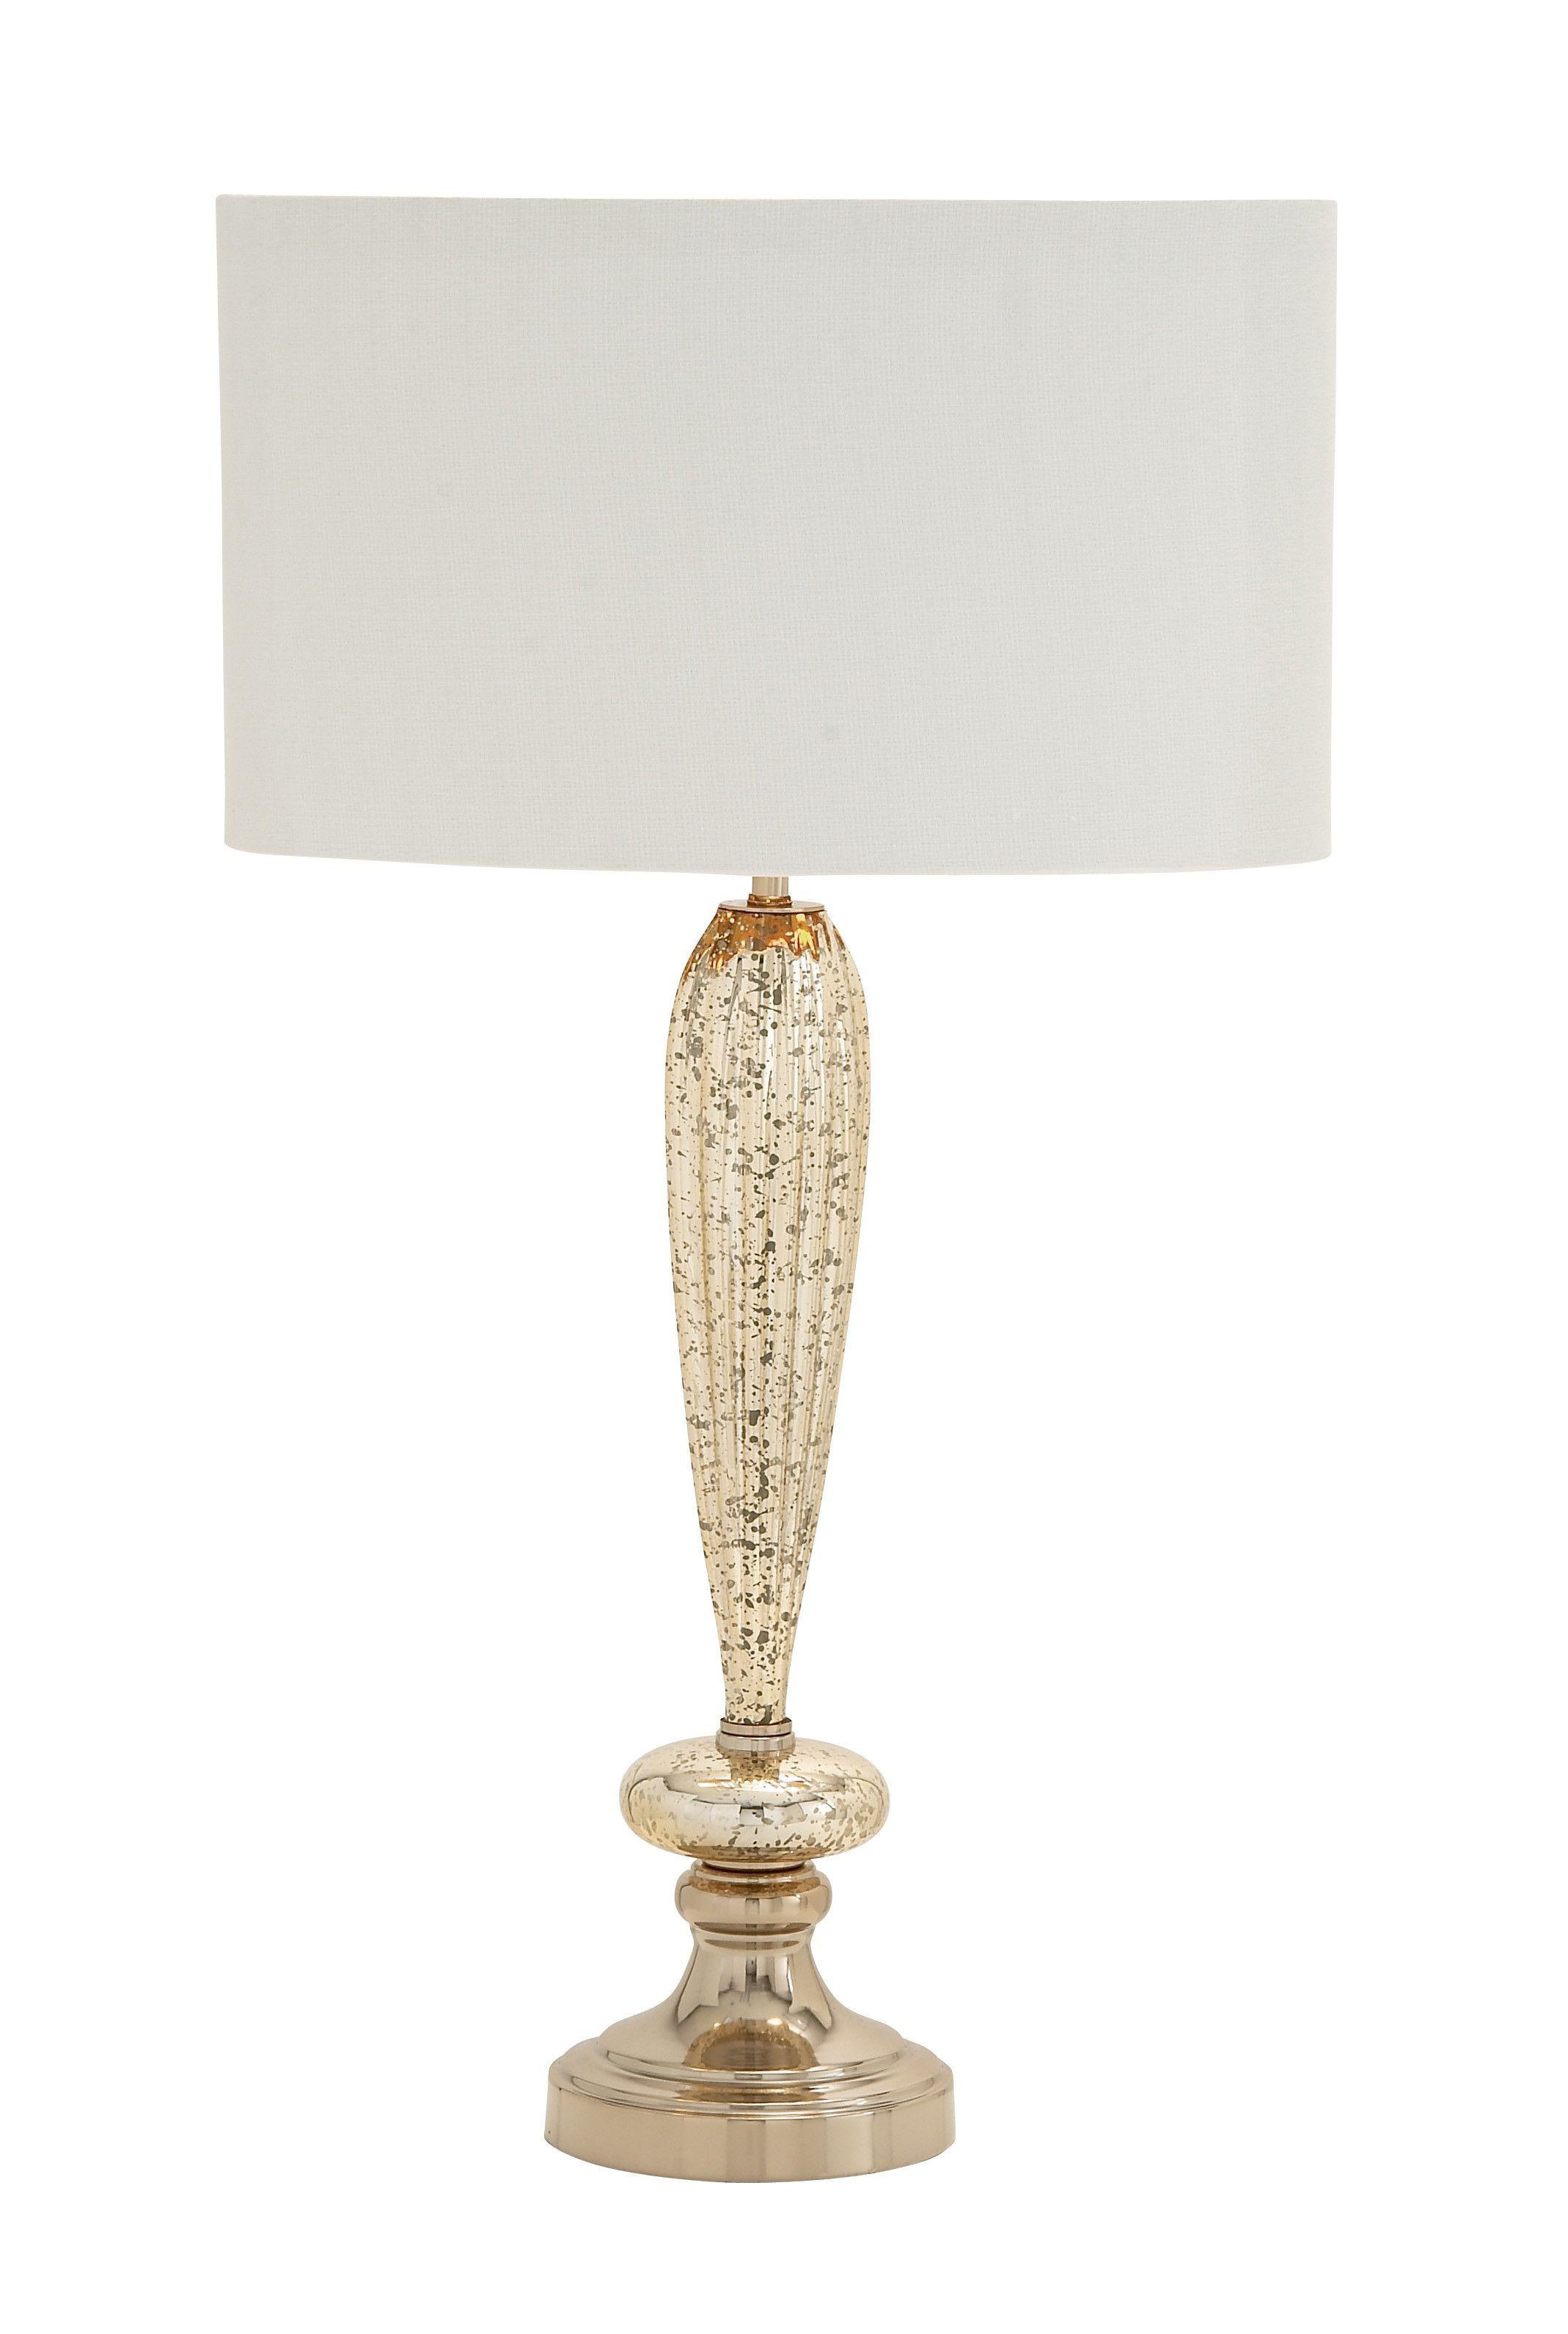 glass euro shea rustic lamp pin urn plus table style possini lamps